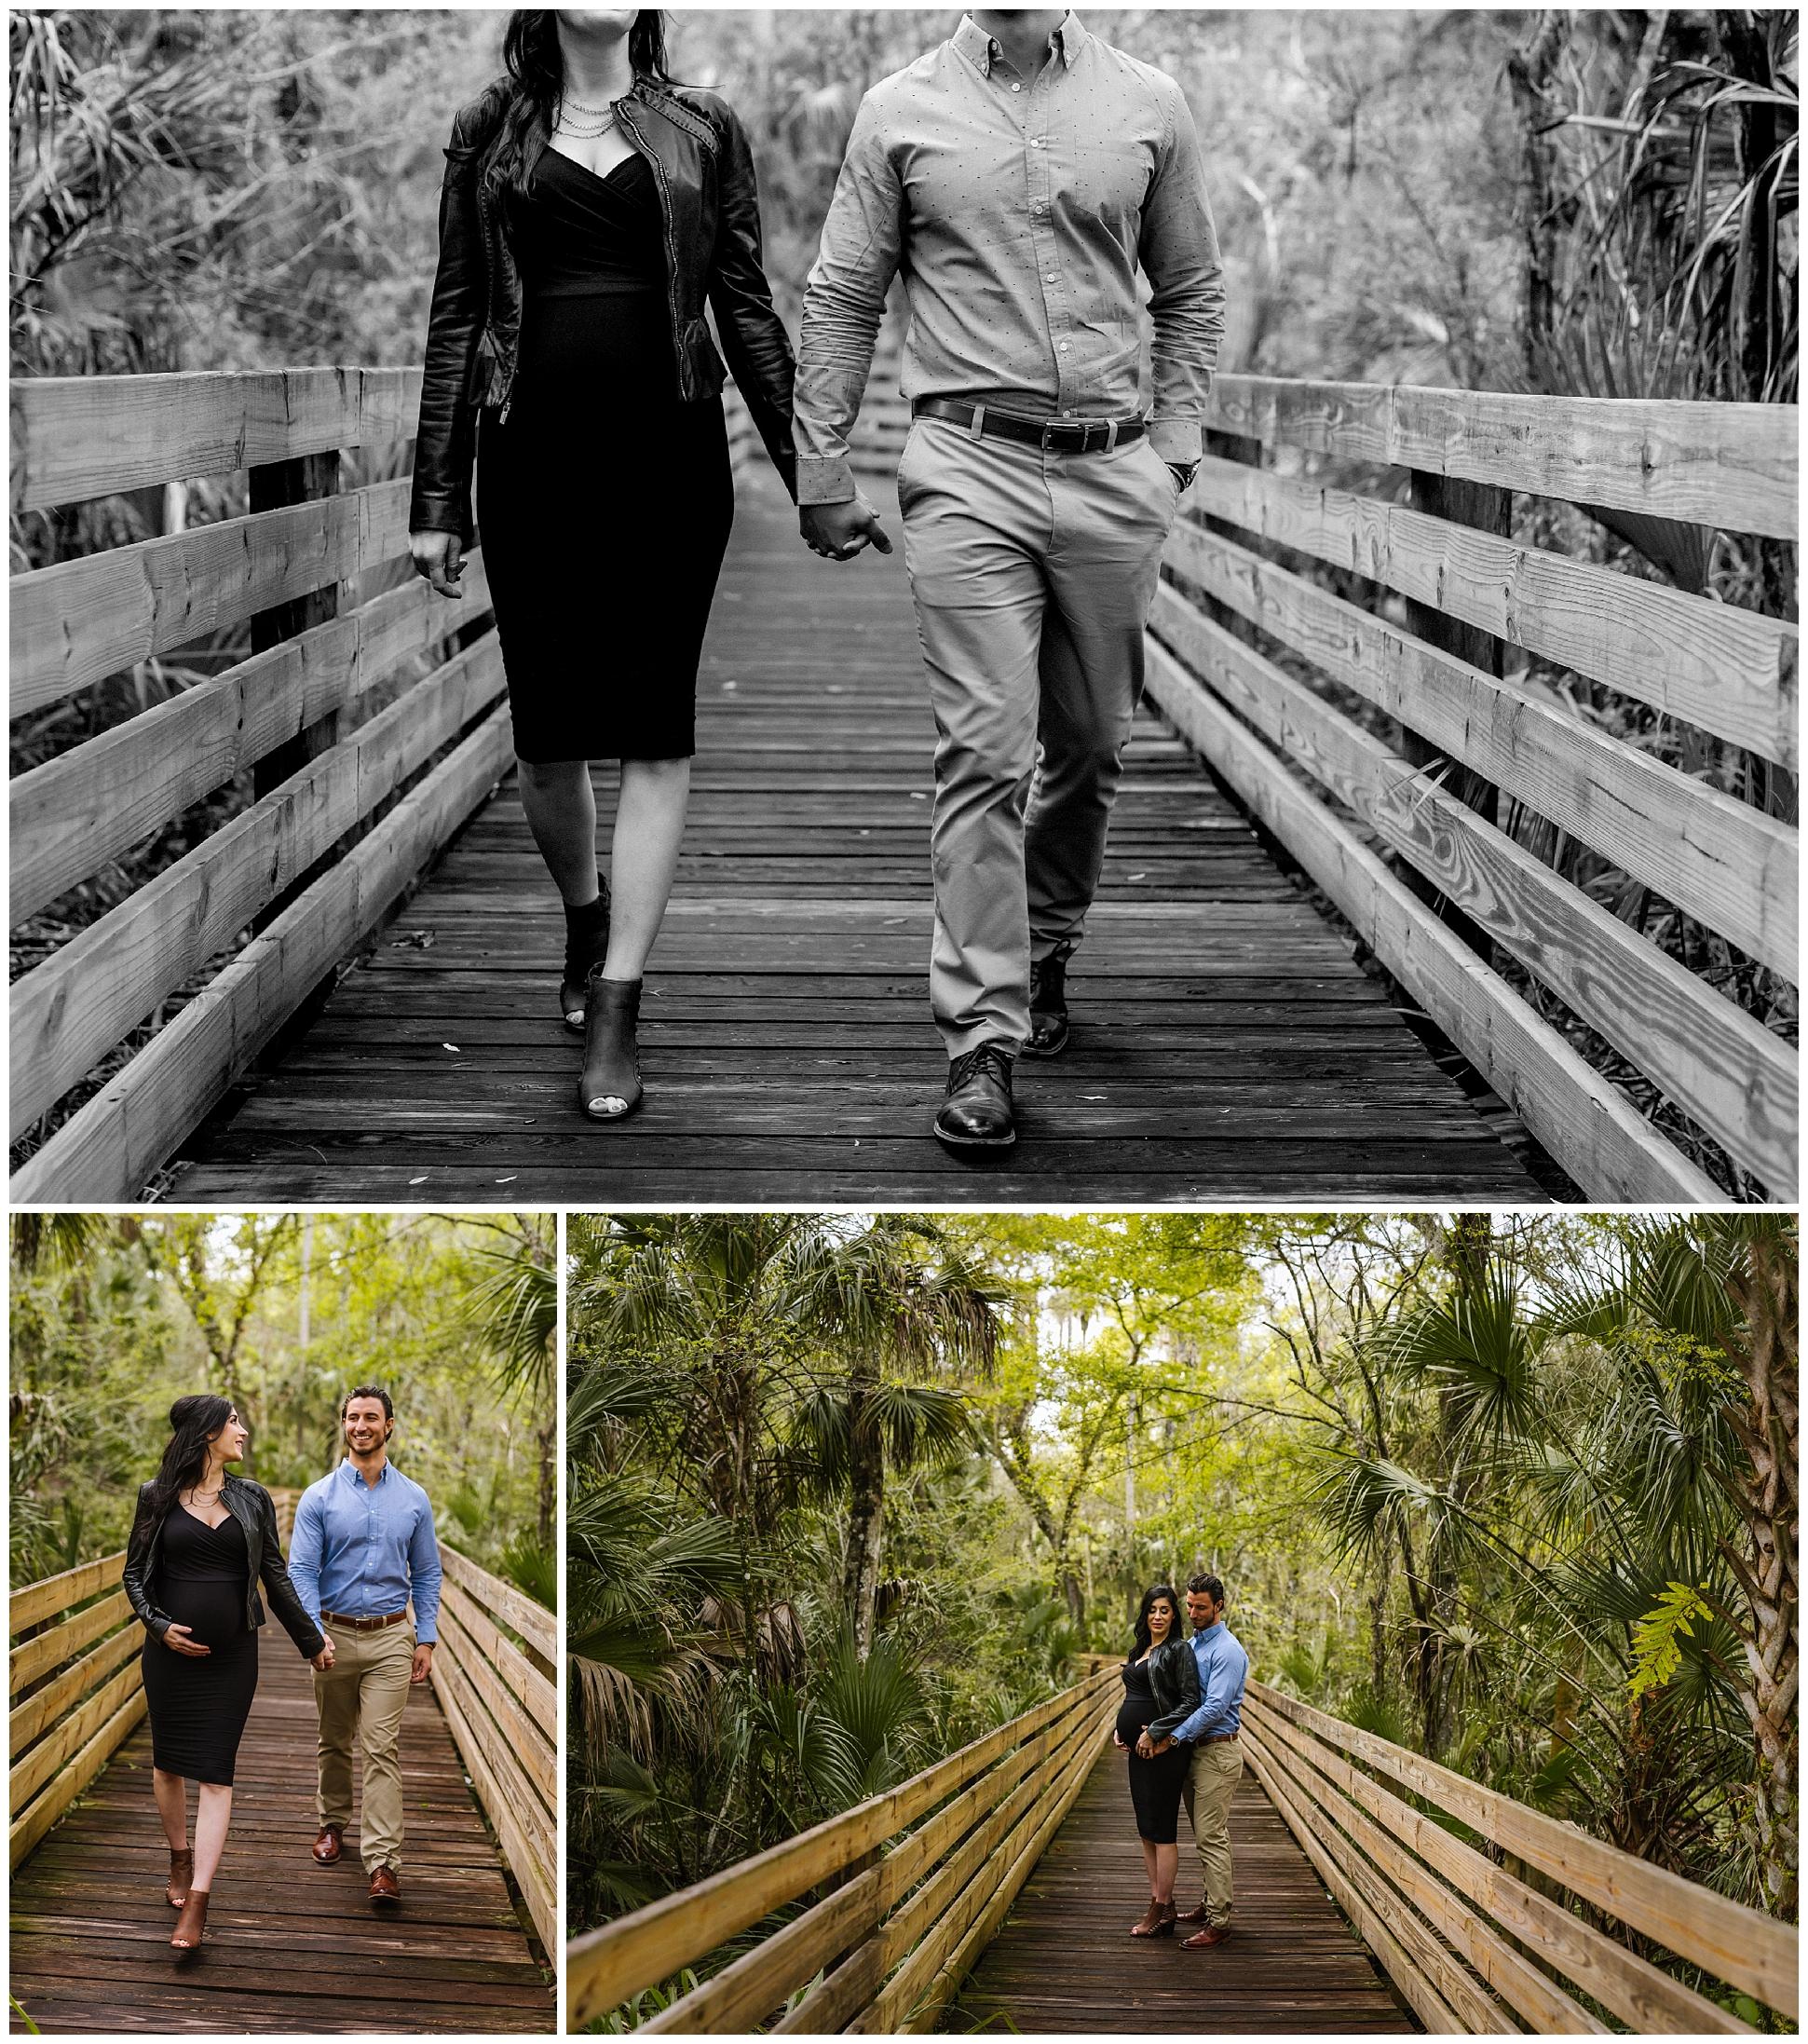 Tampa-maternity-photographer-morris-bridge-park-hip-tight-black-dress-woods_0001.jpg